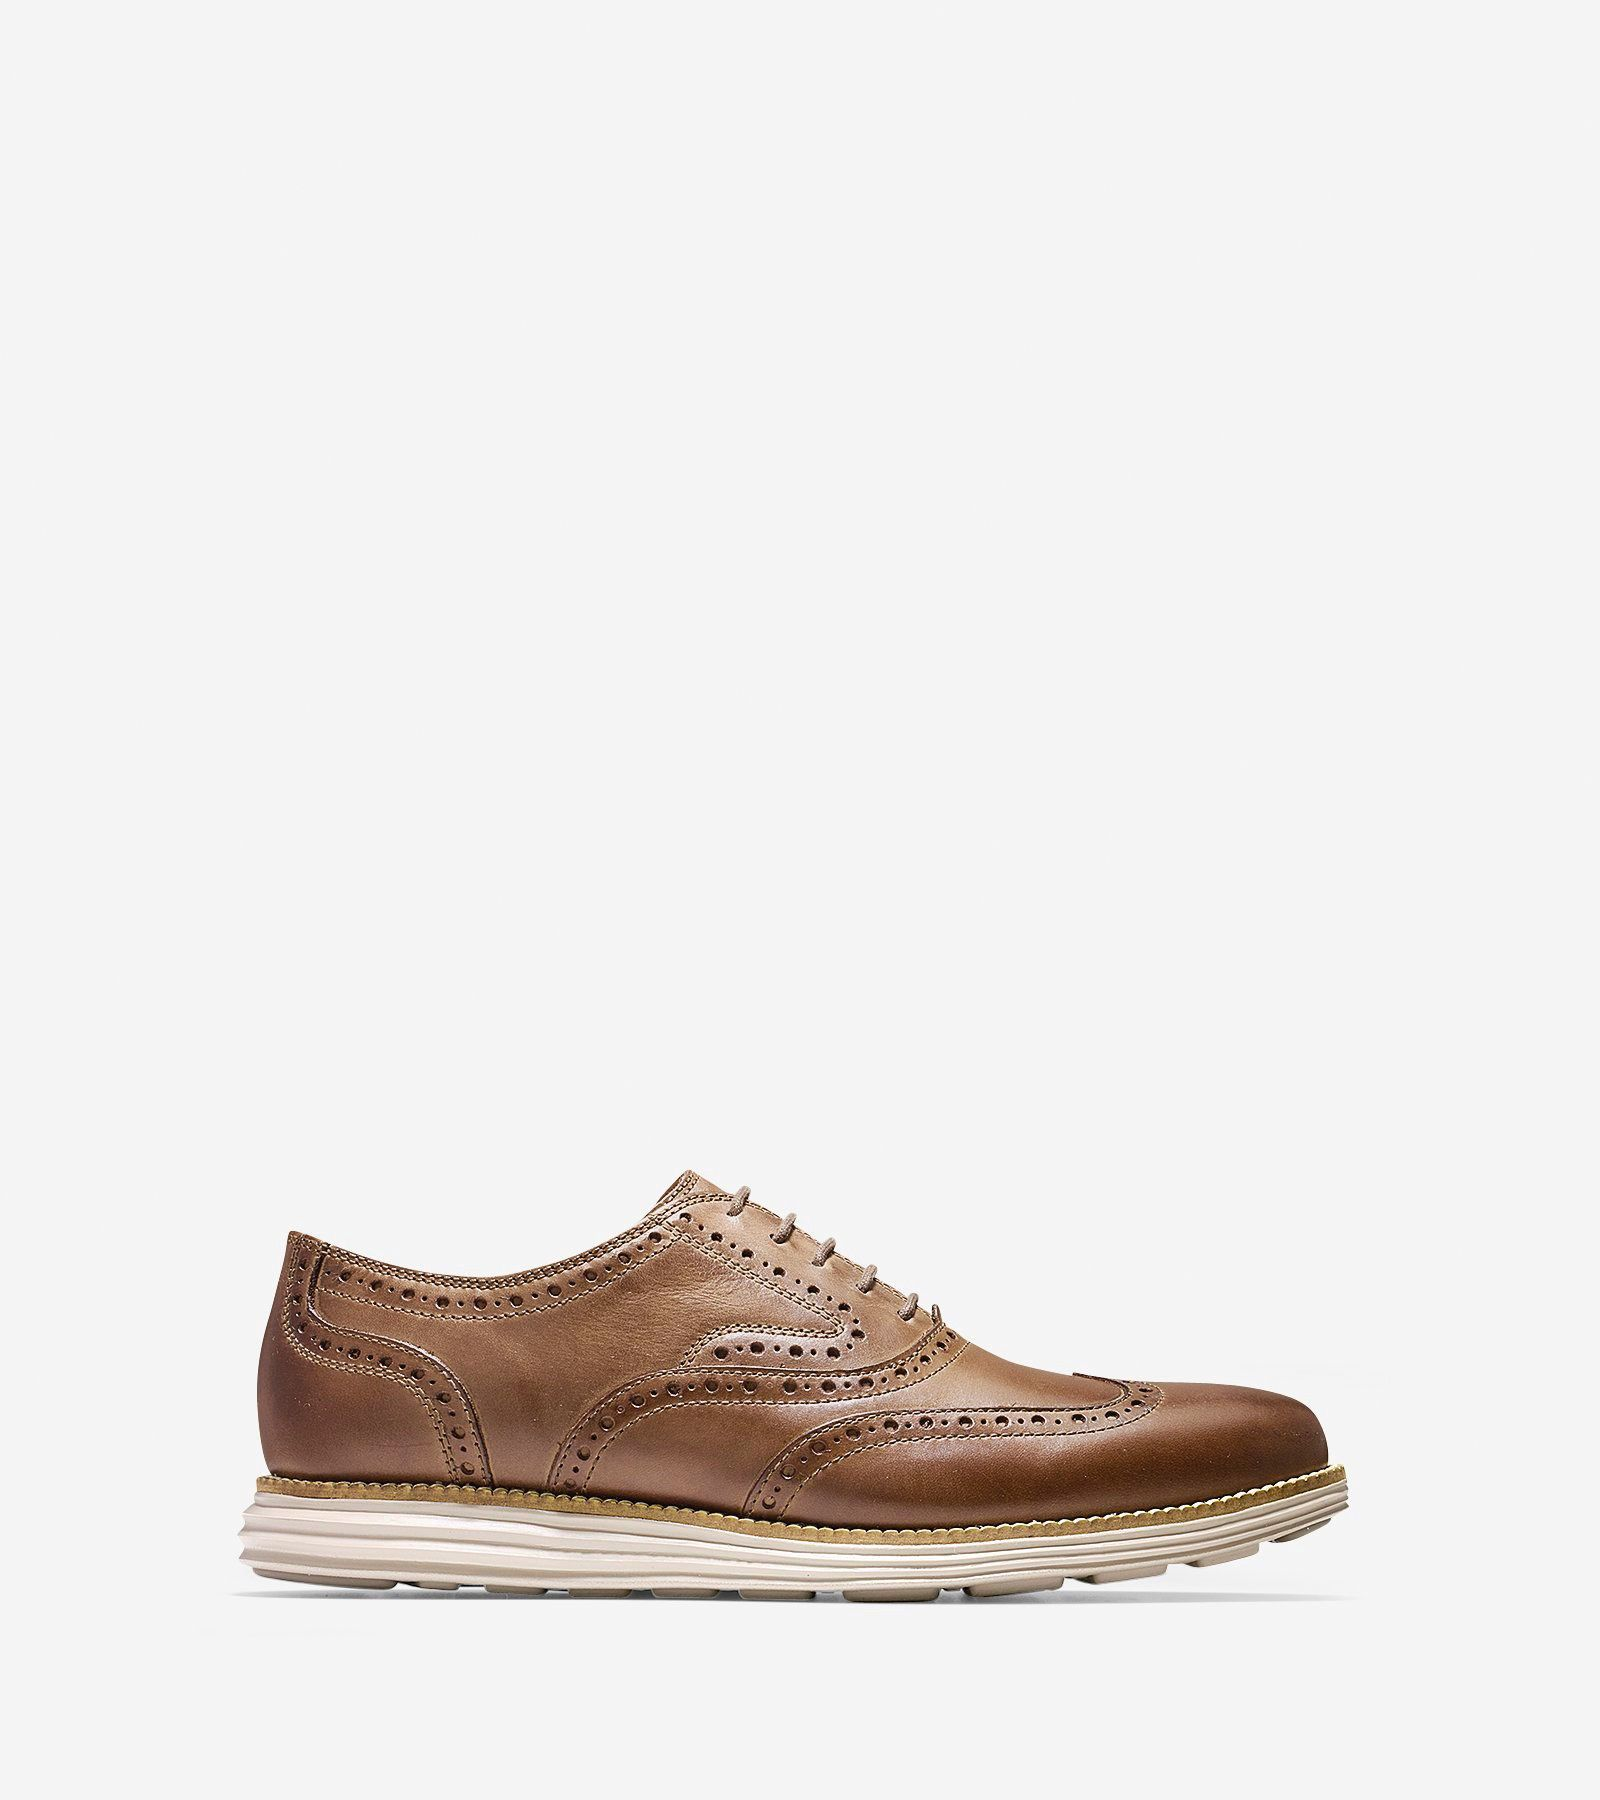 COLE HAAN Men's ØriginalGrand Short Wingtip Oxford - Morel-cobblestone. # colehaan #shoes